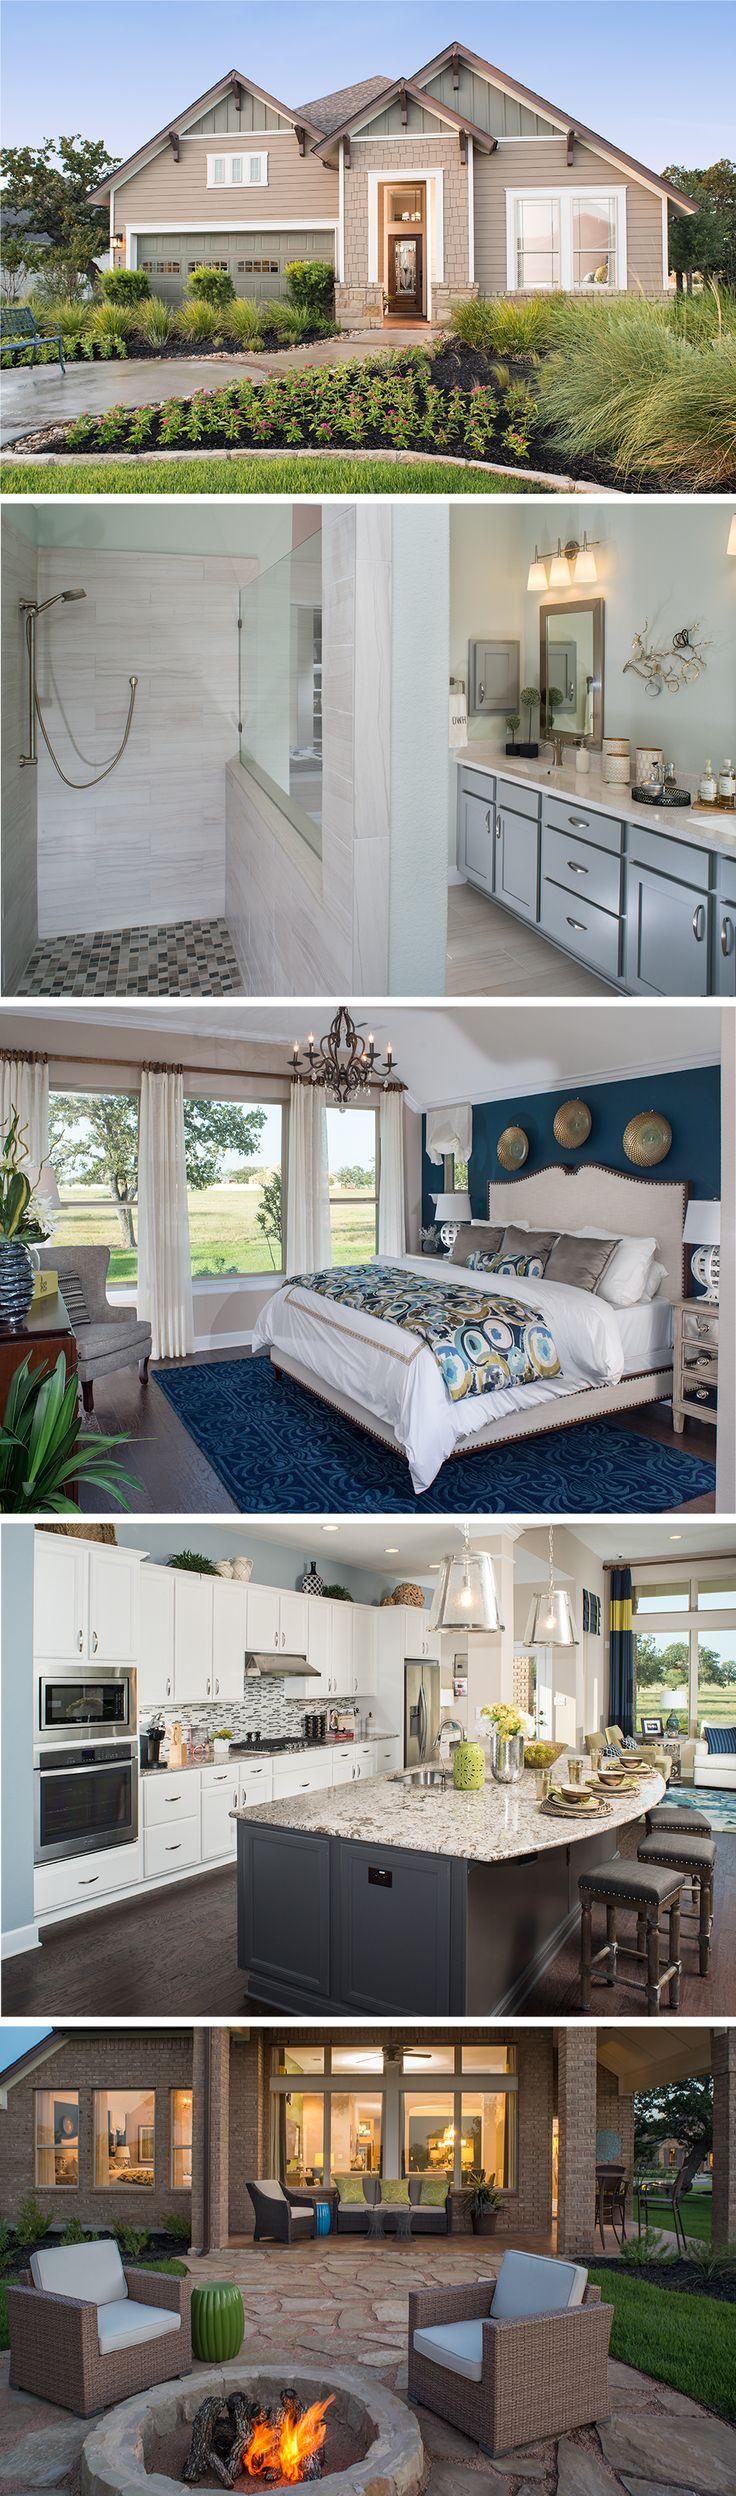 5296 best building dream house 2017 images on pinterest